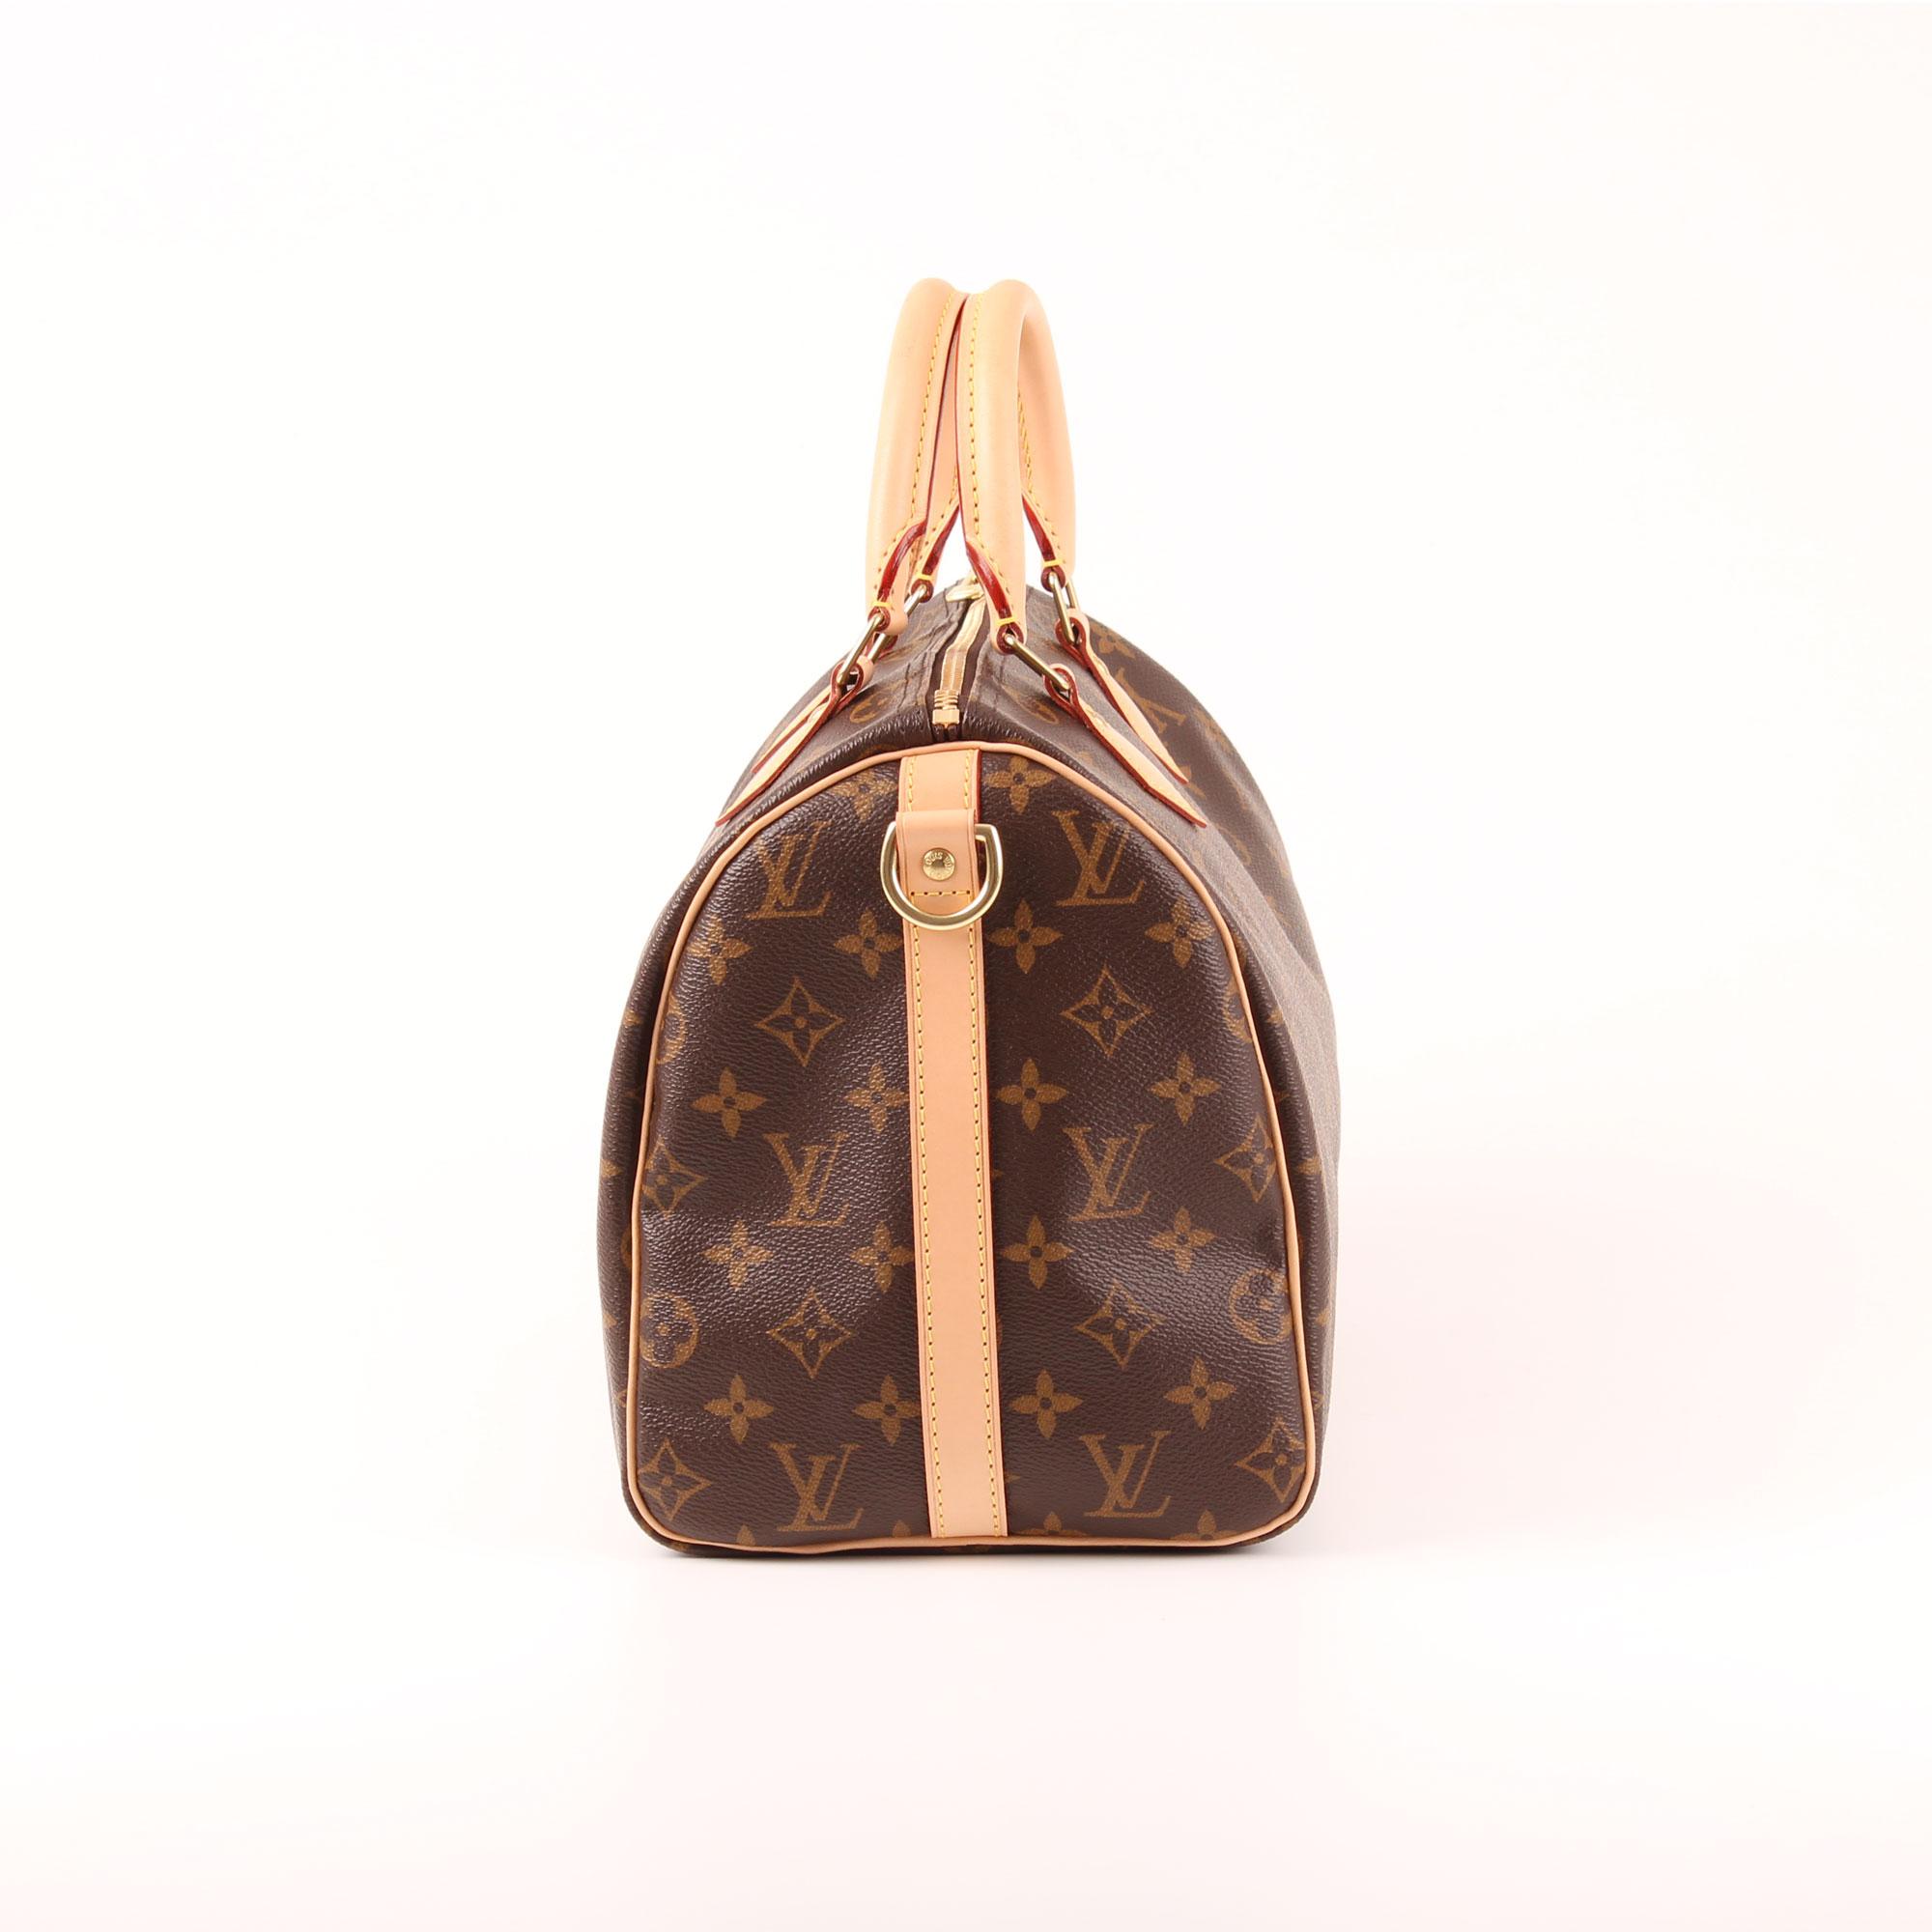 Imagen del lado 2 del bolso louis vuitton speedy 30 monogram bandolera piel  natural d4212a8ad575e